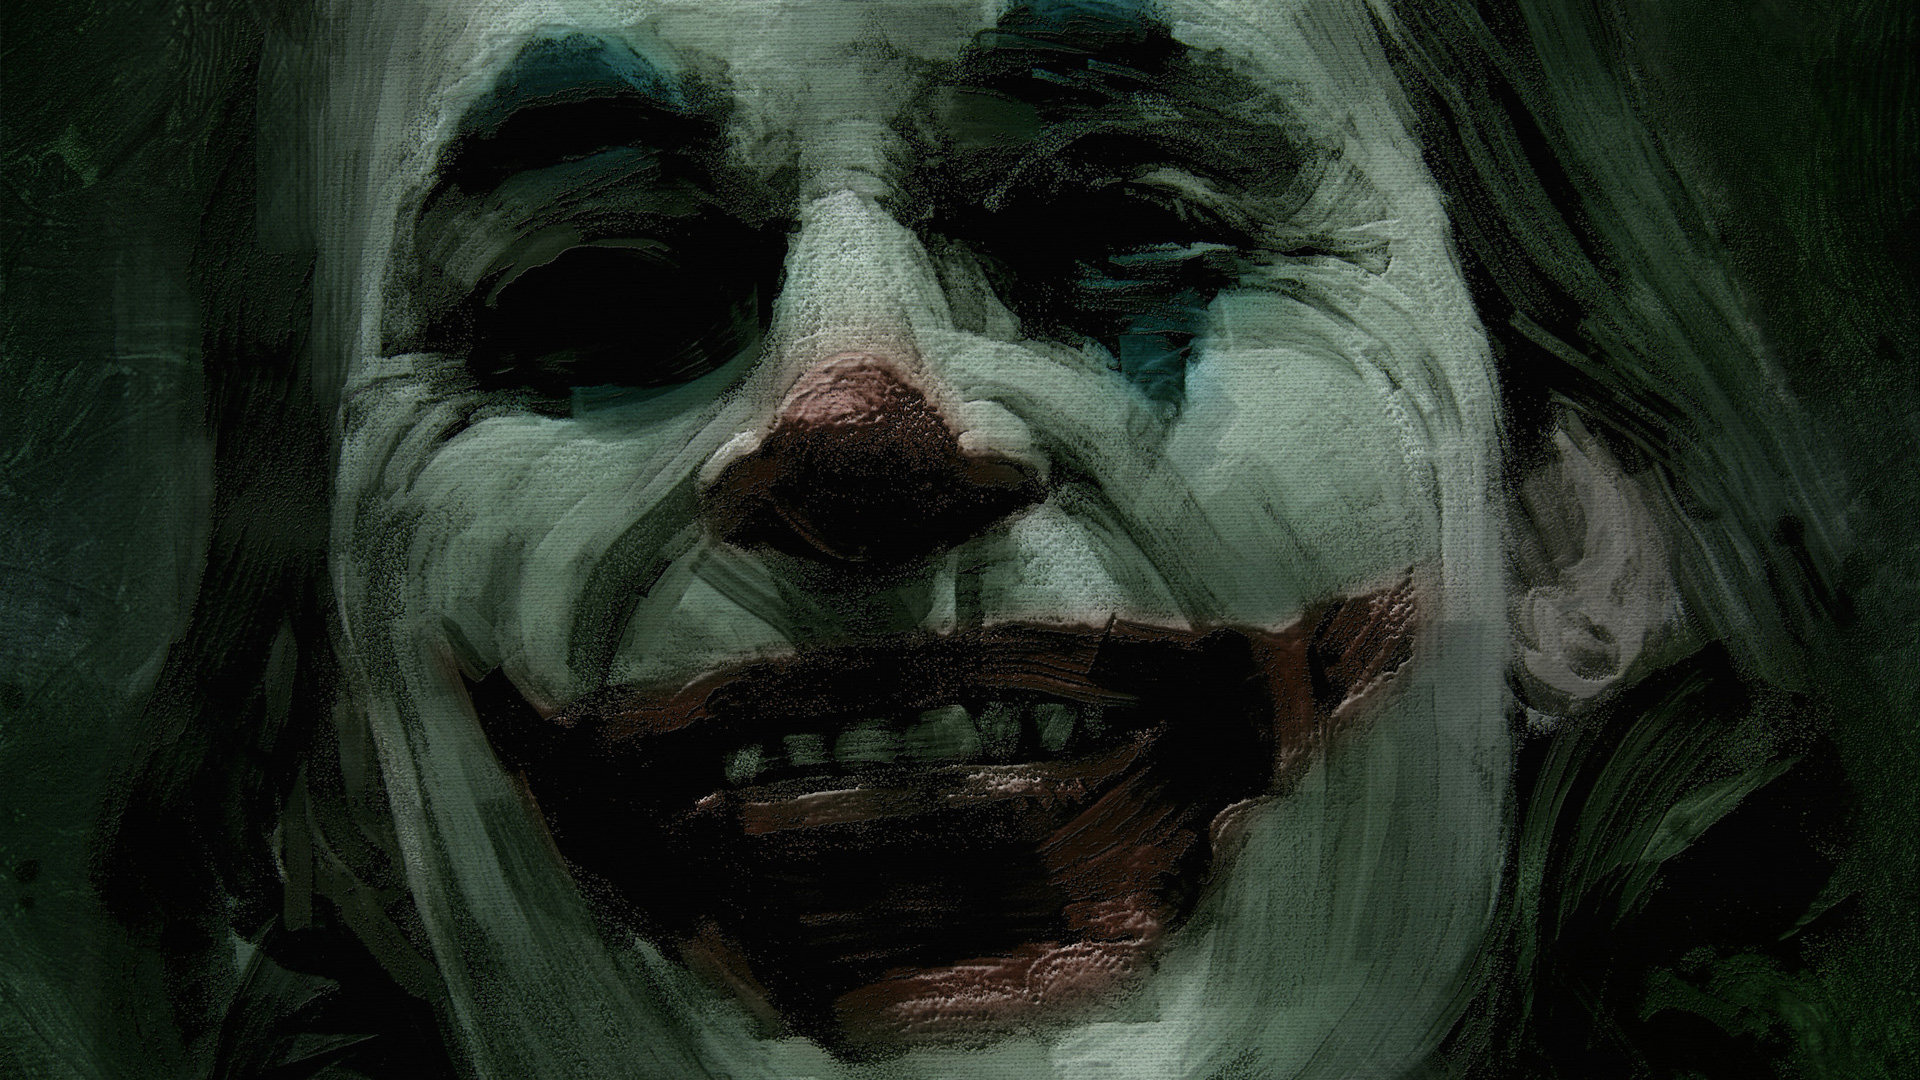 The Joker Joaquin Phoenix 2019 Hd Movies 4k Wallpapers